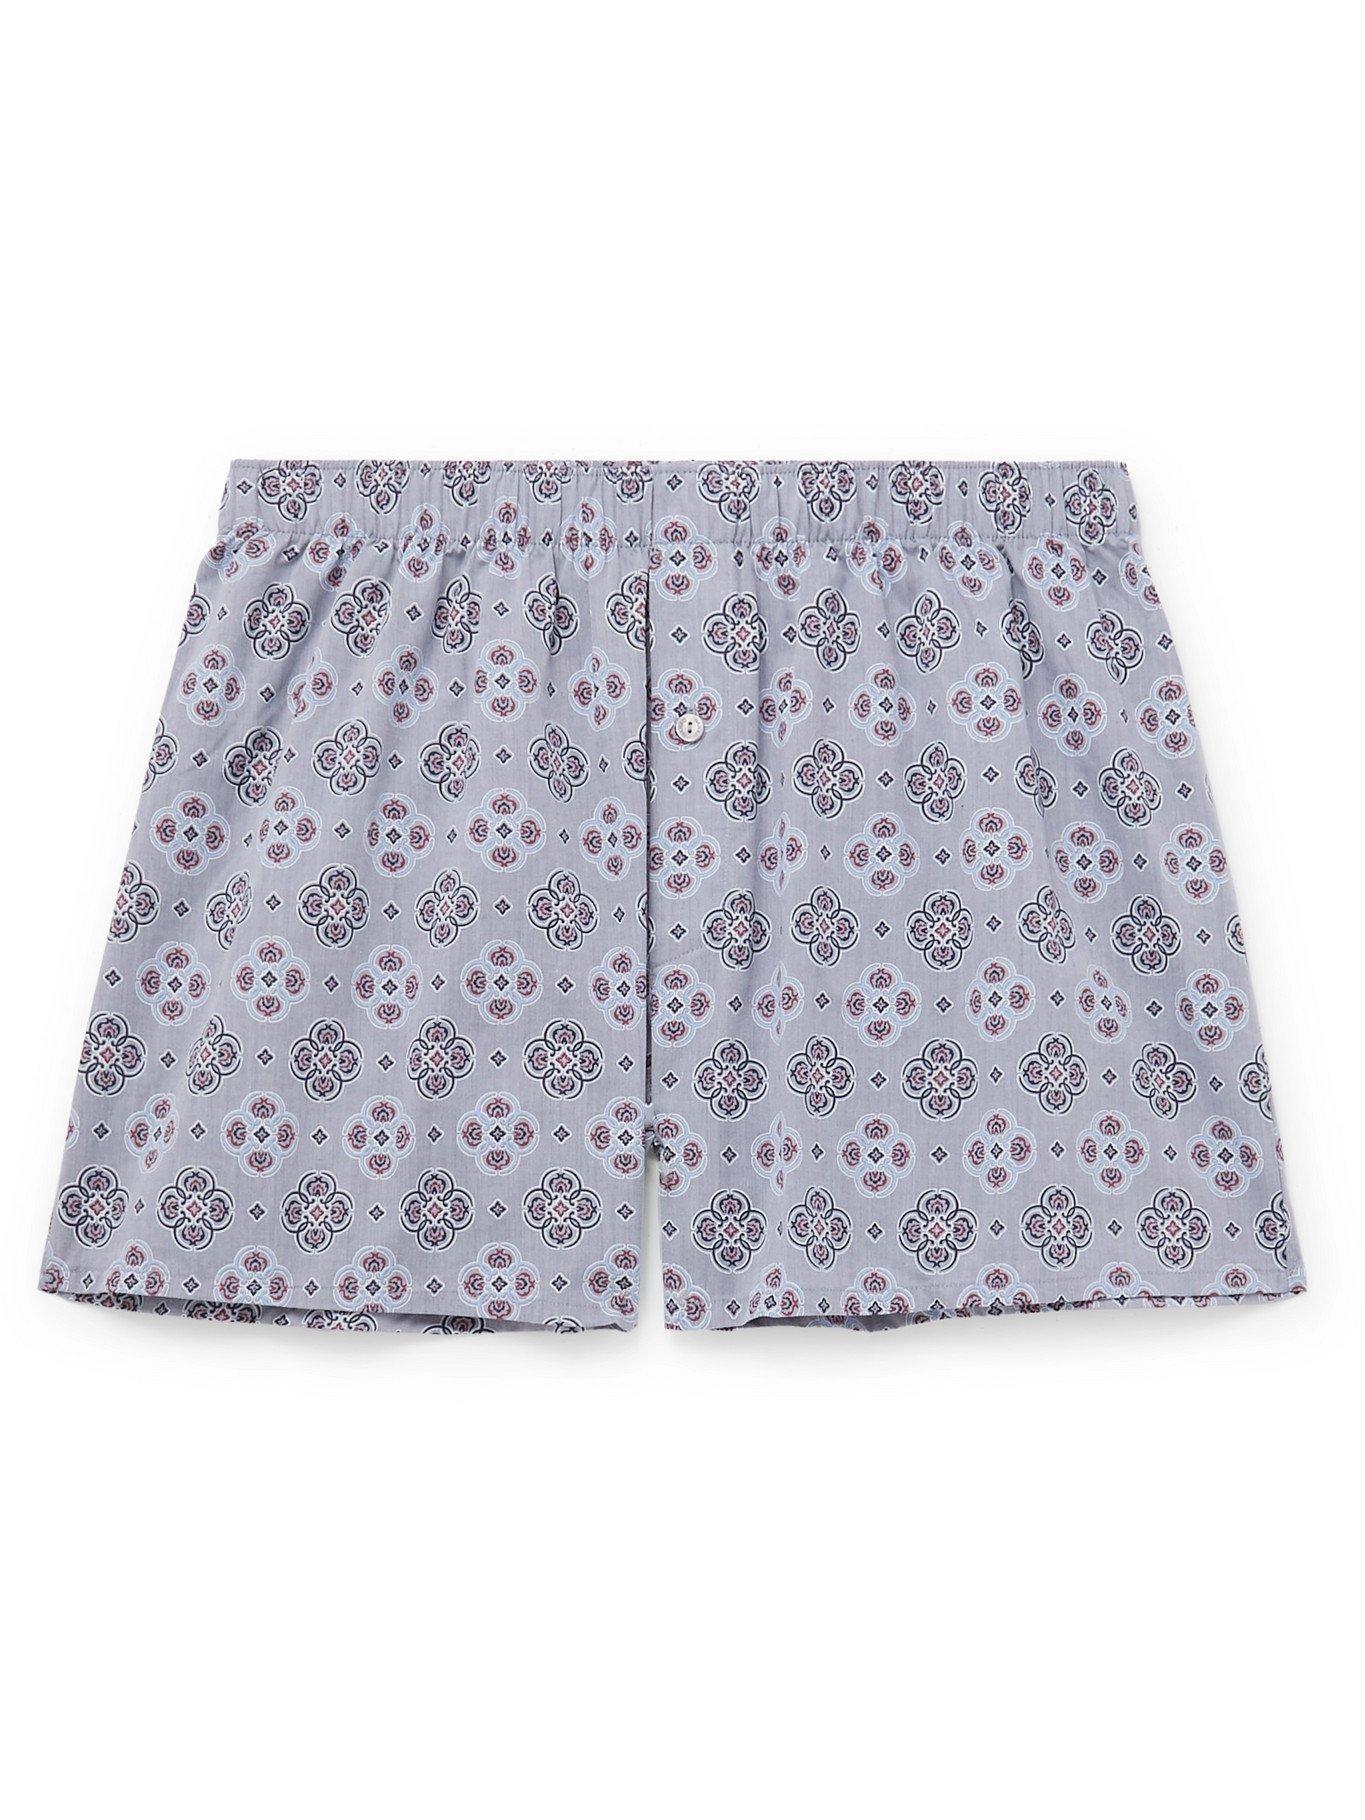 HANRO - Printed Cotton Boxer Shorts - Blue - XL